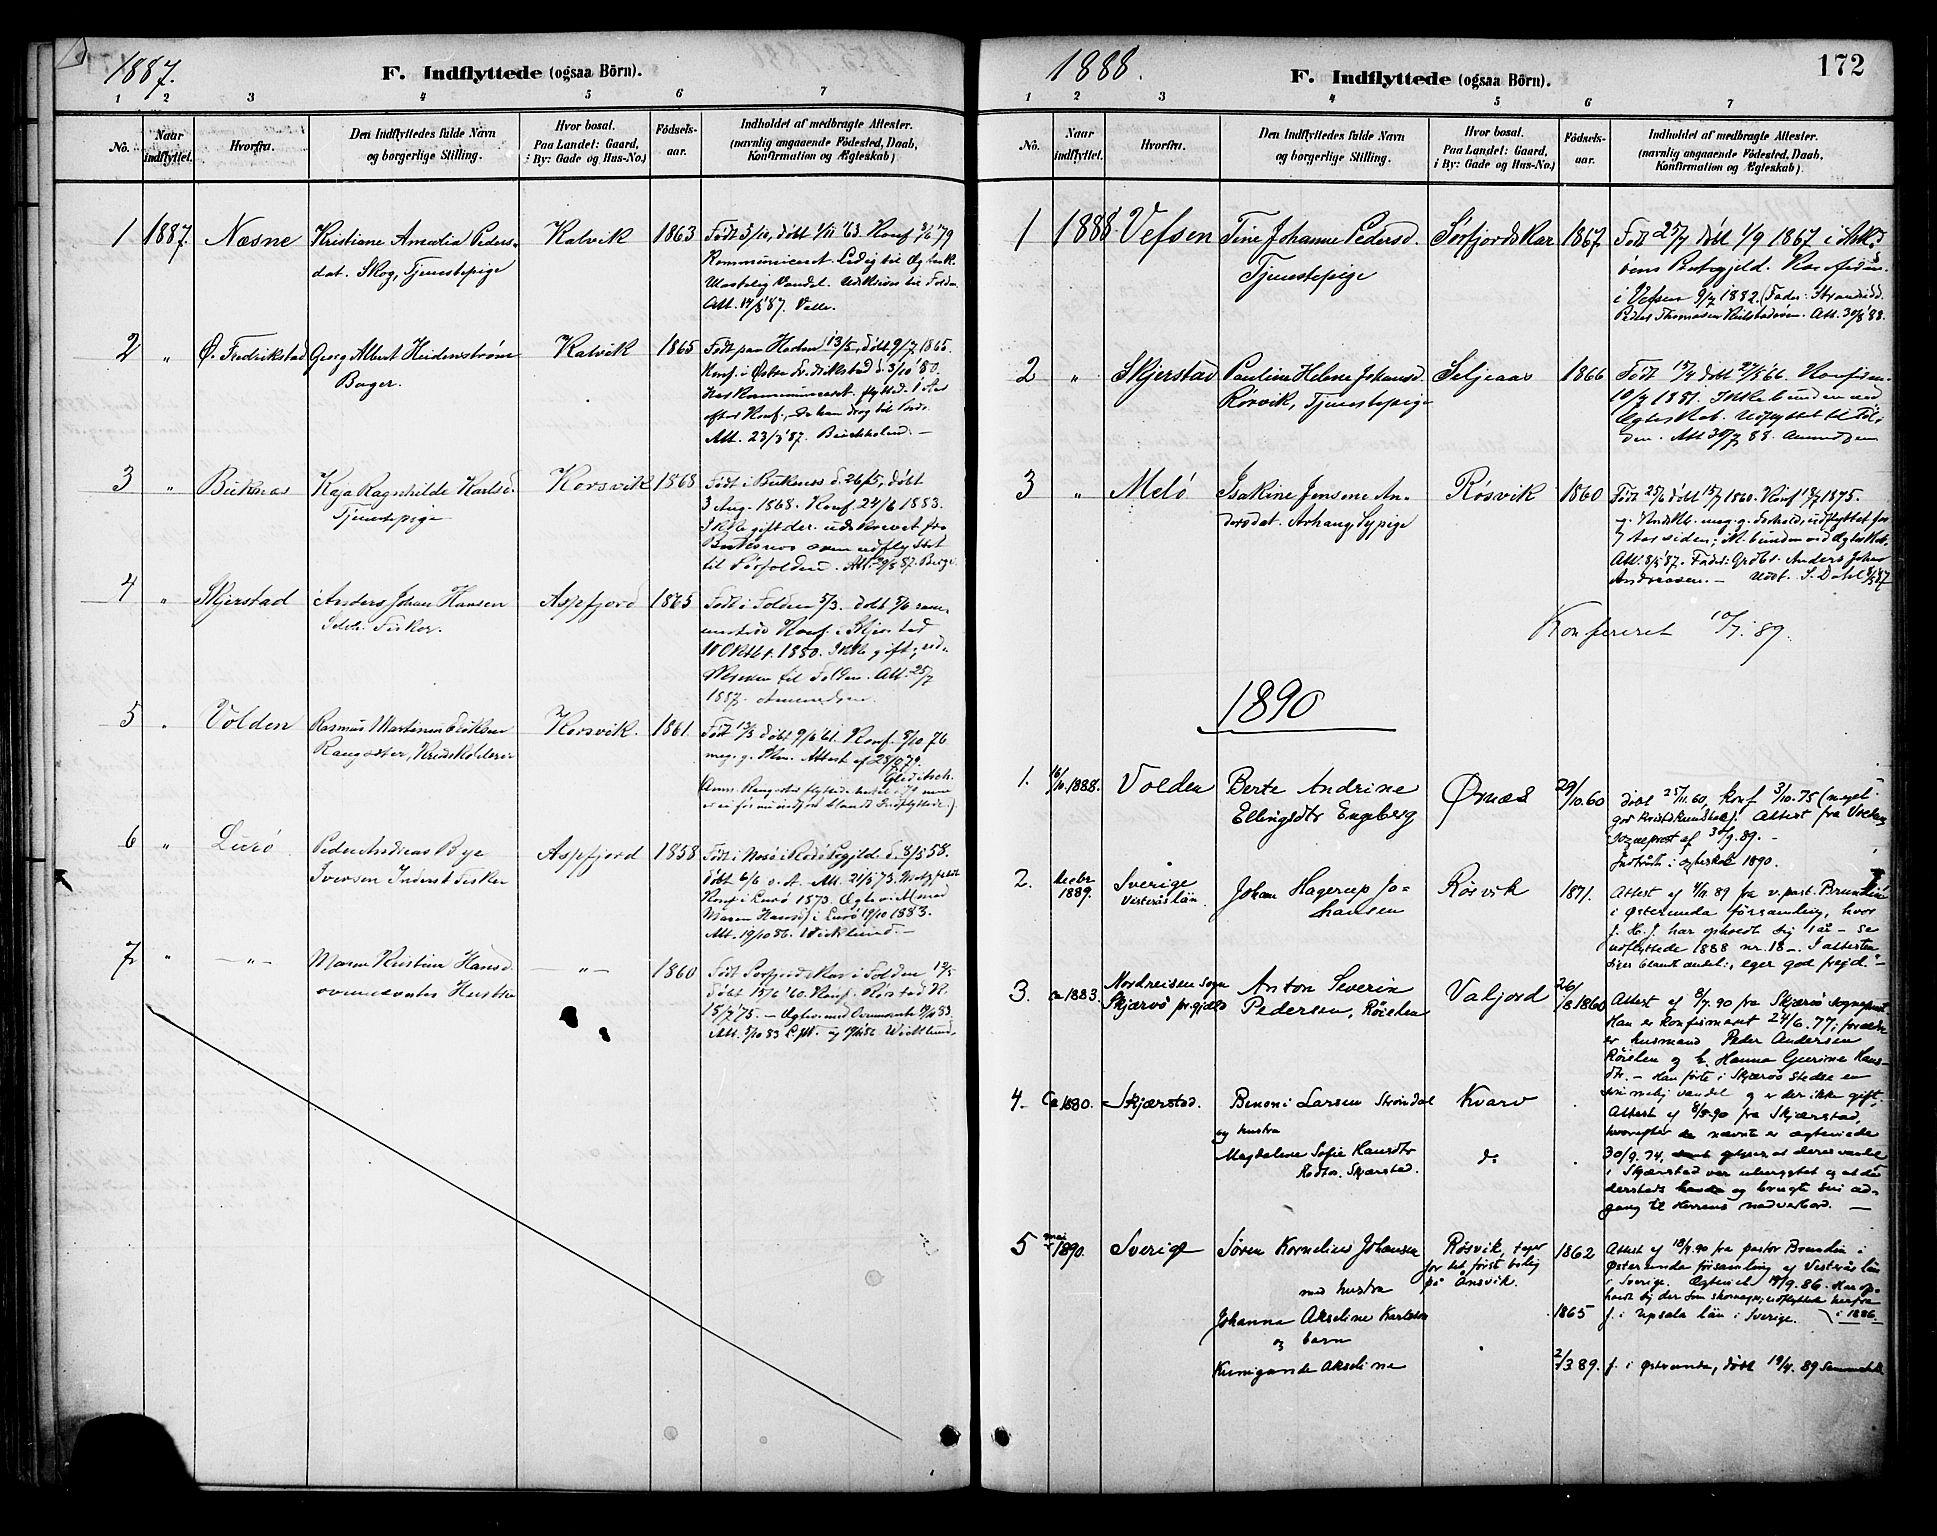 SAT, Ministerialprotokoller, klokkerbøker og fødselsregistre - Nordland, 854/L0777: Ministerialbok nr. 854A01 /1, 1883-1891, s. 172